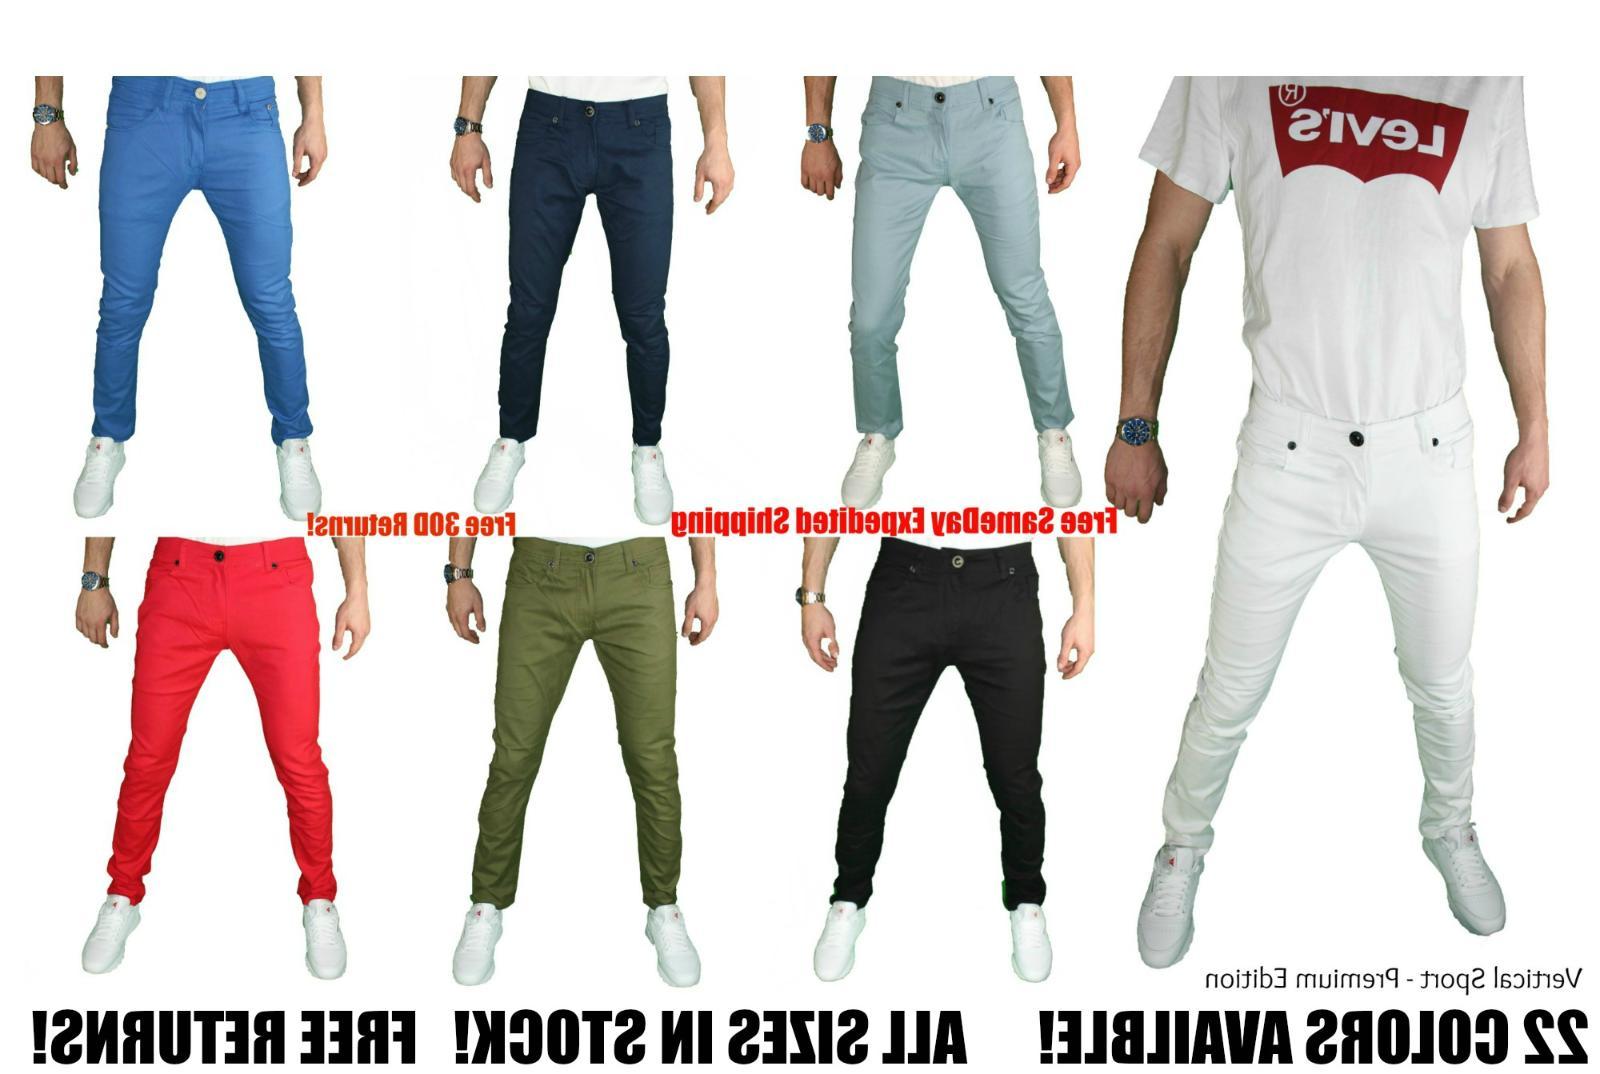 mens skinny jeans slim stretch fit slim